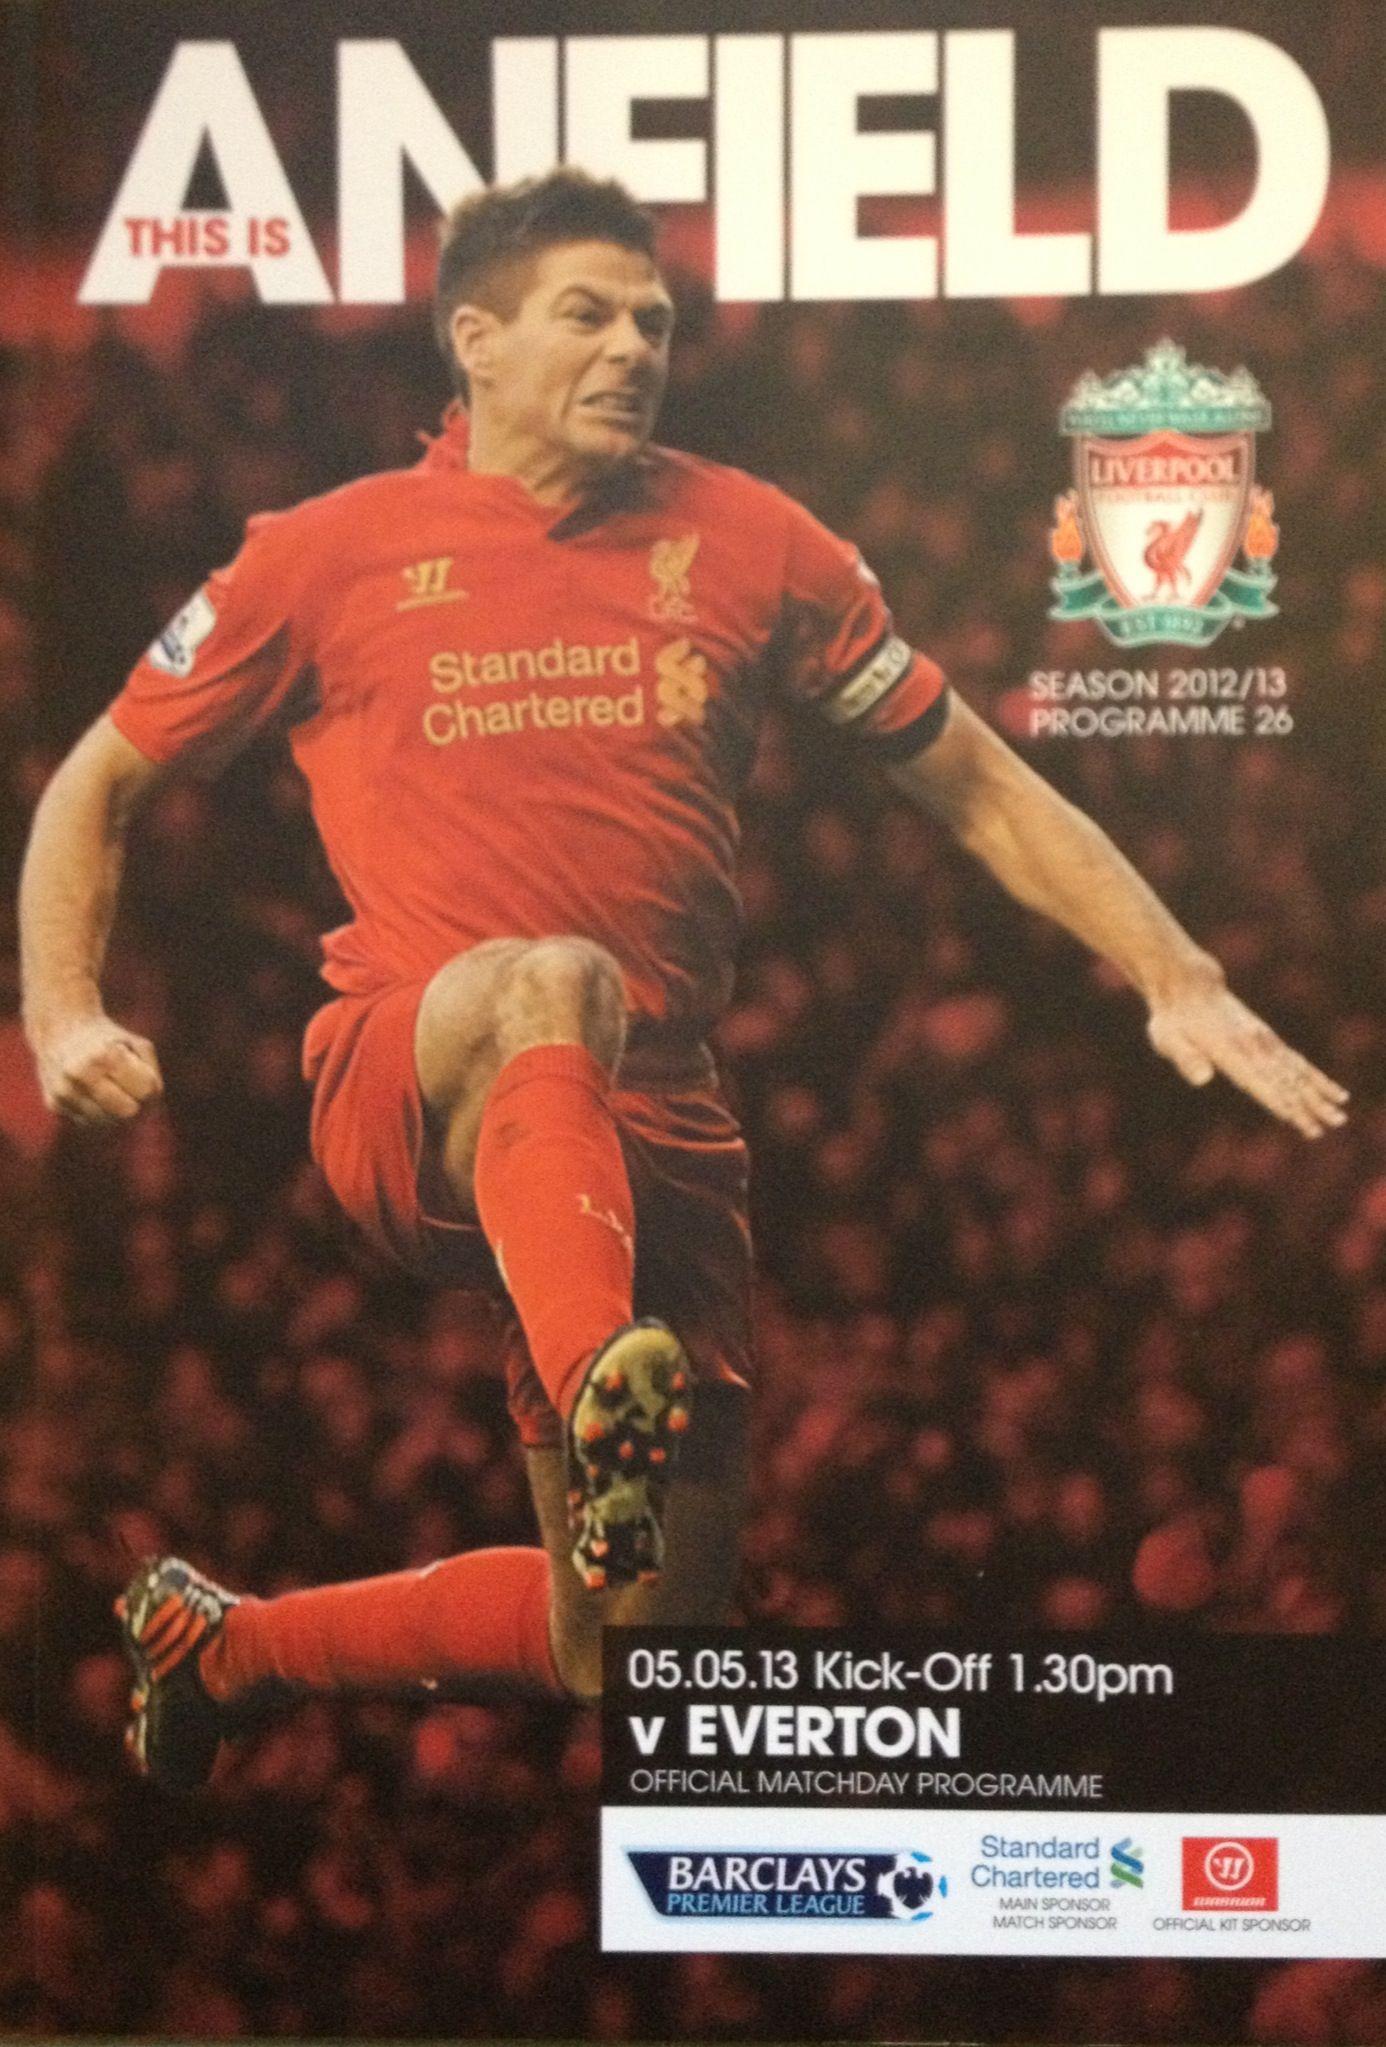 5/5/2013 Liverpool v Everton Football program, Liverpool